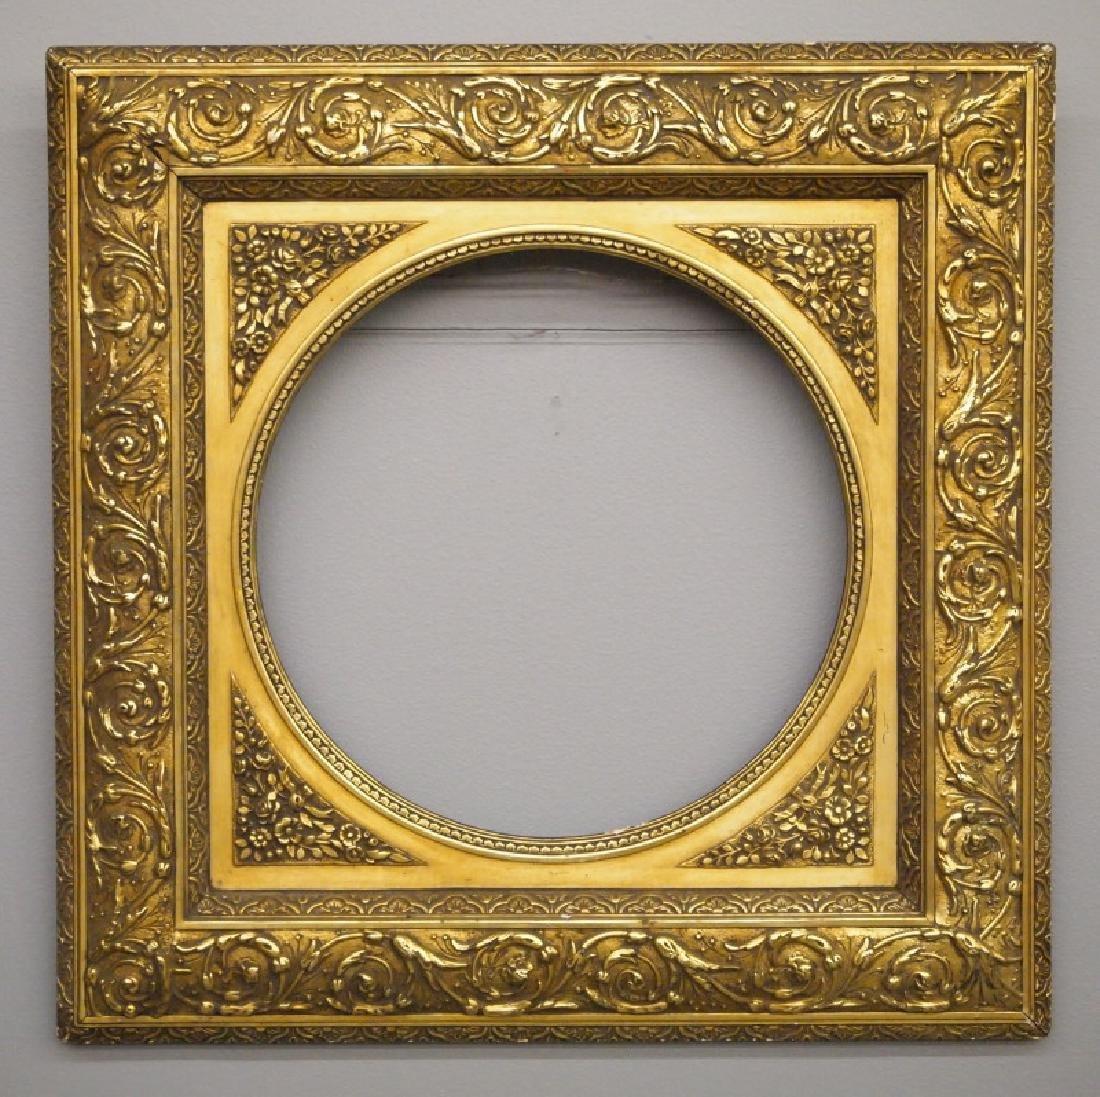 Gilt wood frame